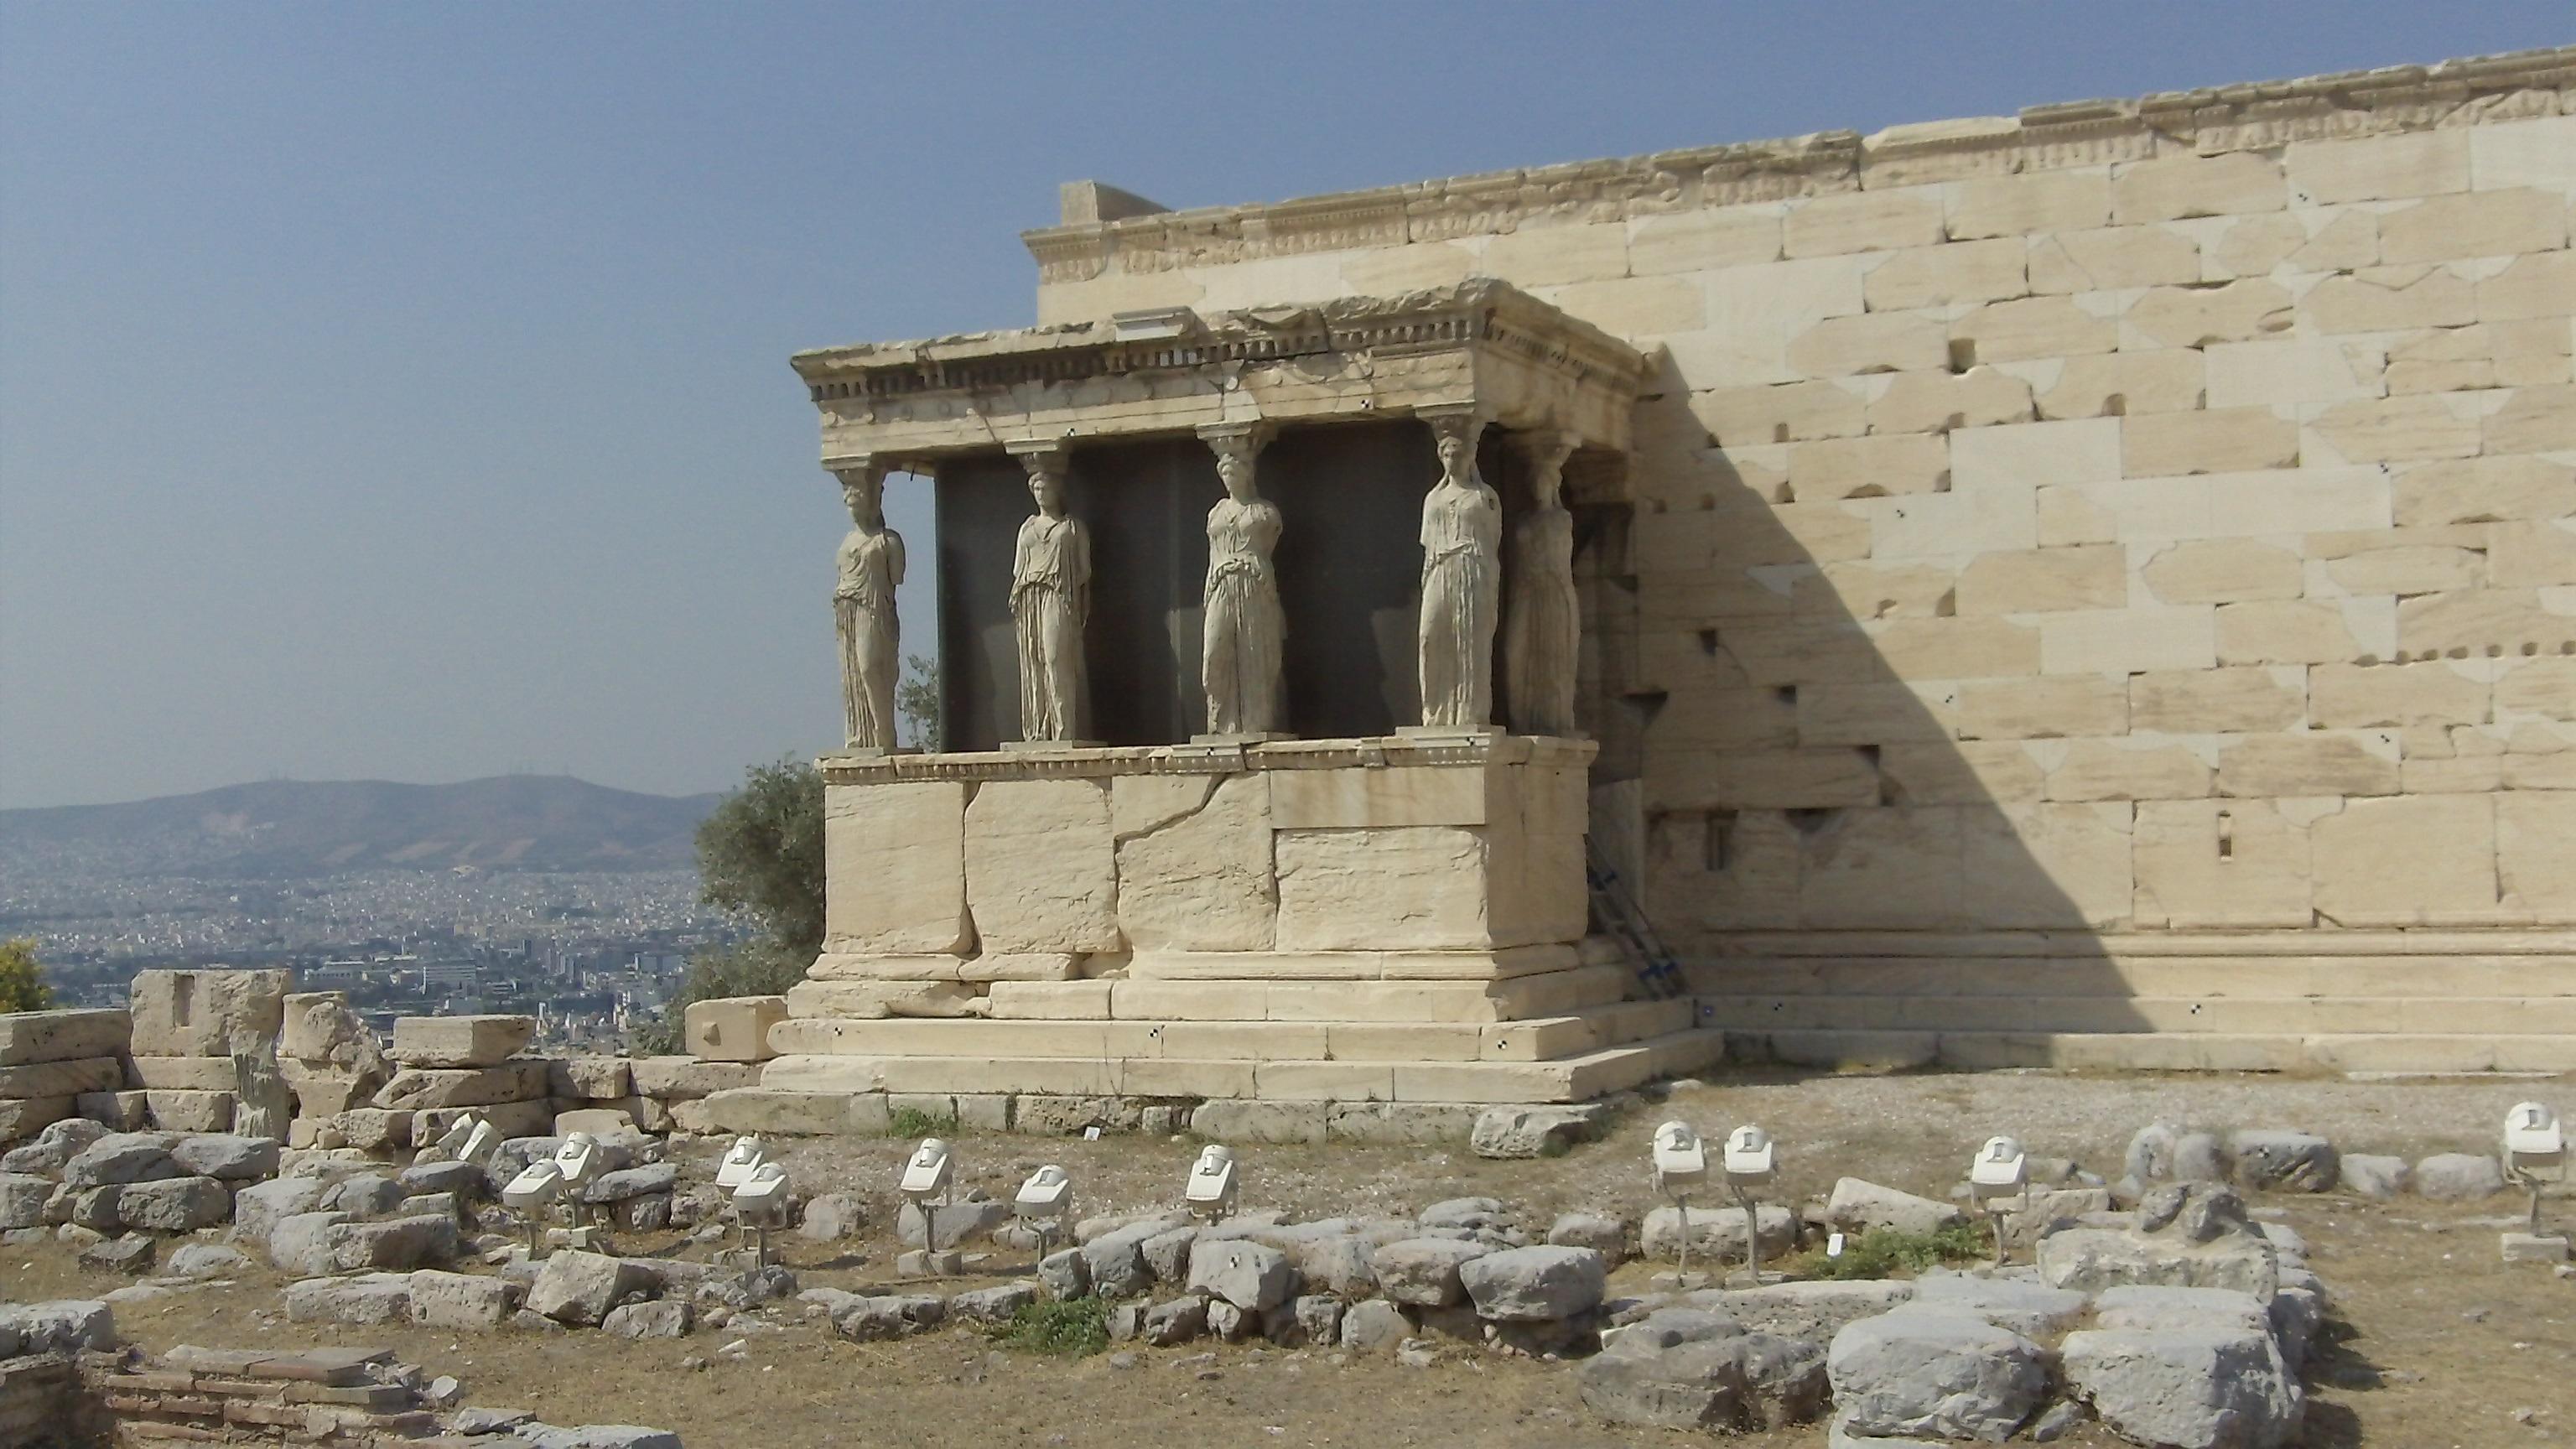 Free Images monument landmark tourism place of worship